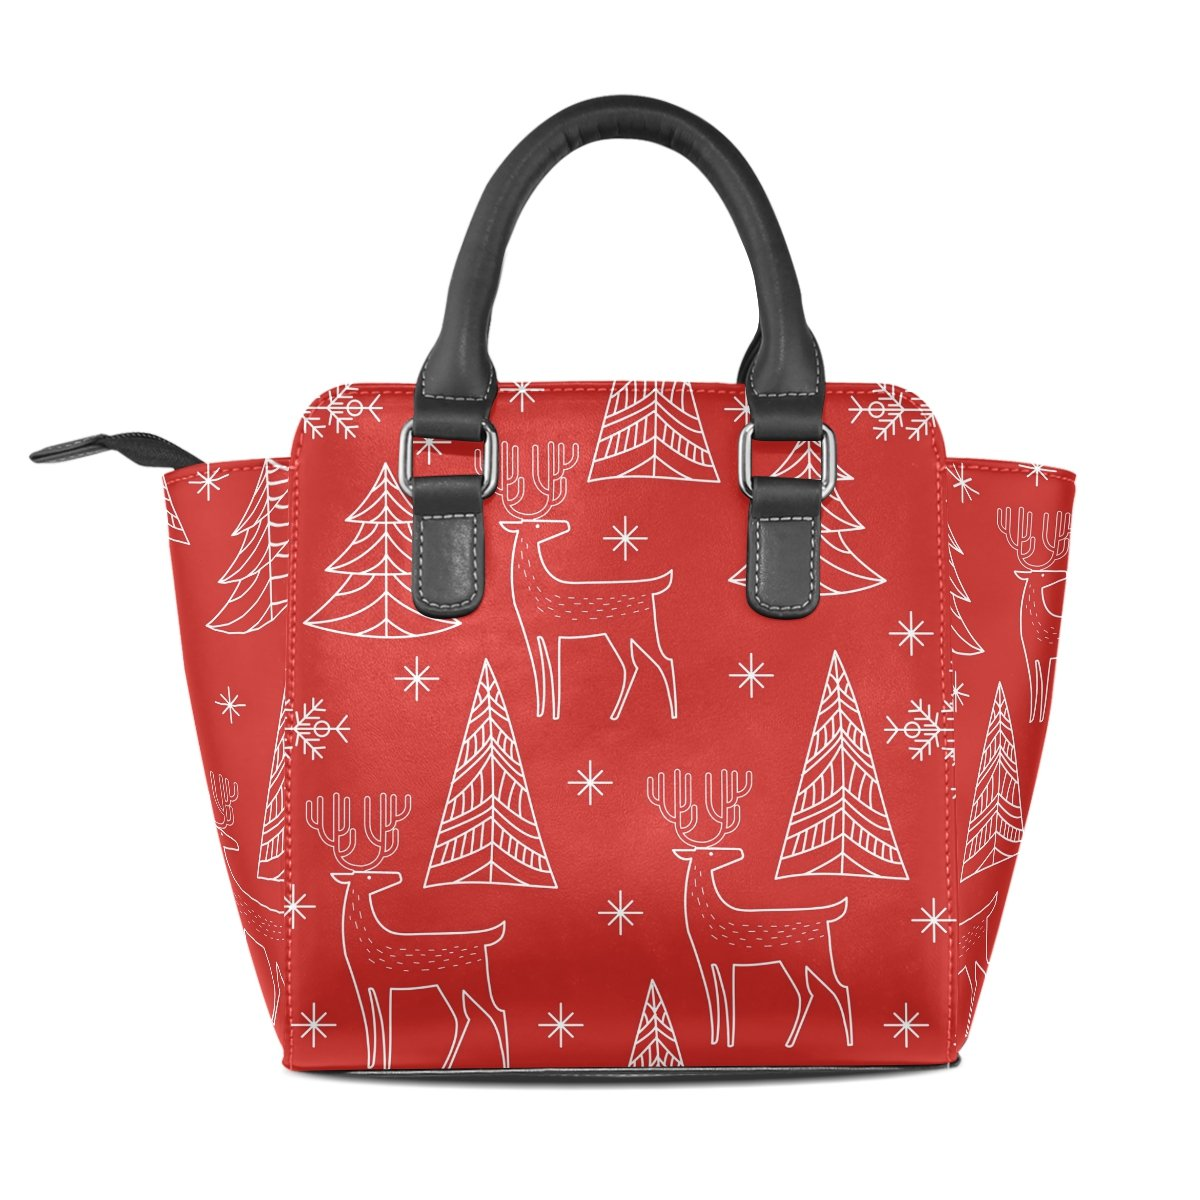 4699e442e6ba Amazon.com: Use4 Women's Cartoon Deer Christmas Tree Red Rivet PU ...